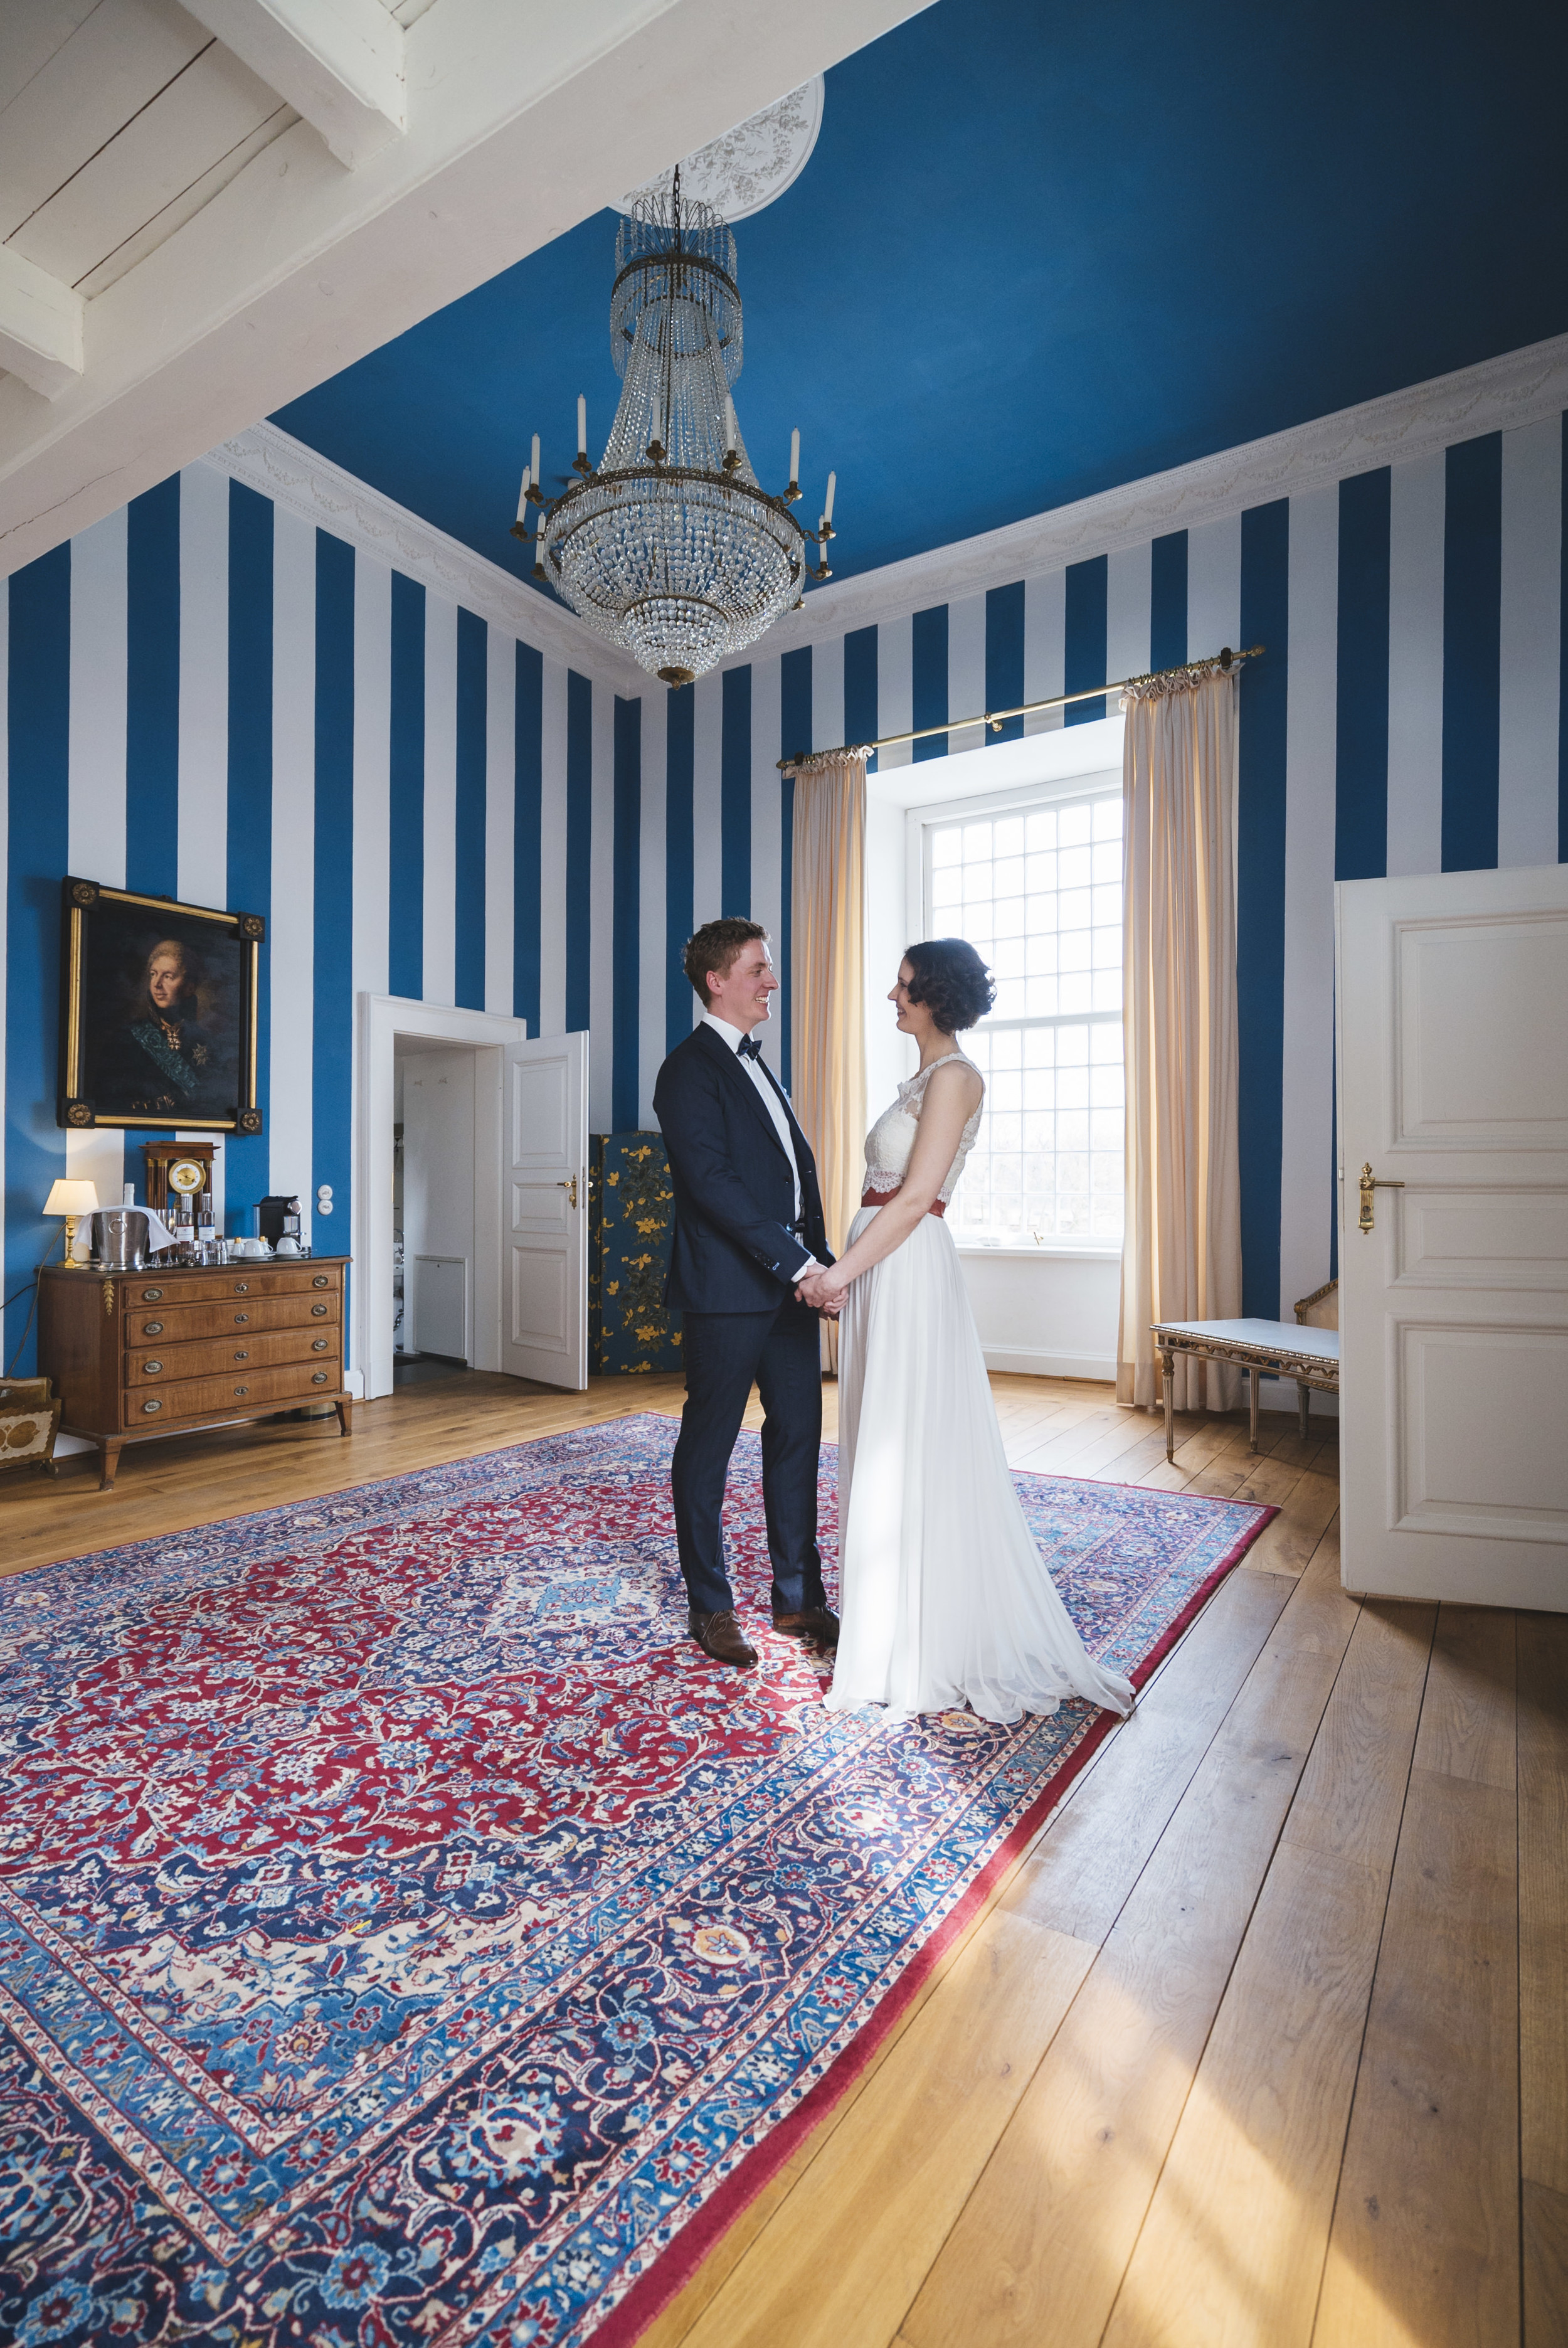 Hochzeitsfotograf-Schlossruine-Hertefeld-Weeze-020.jpg